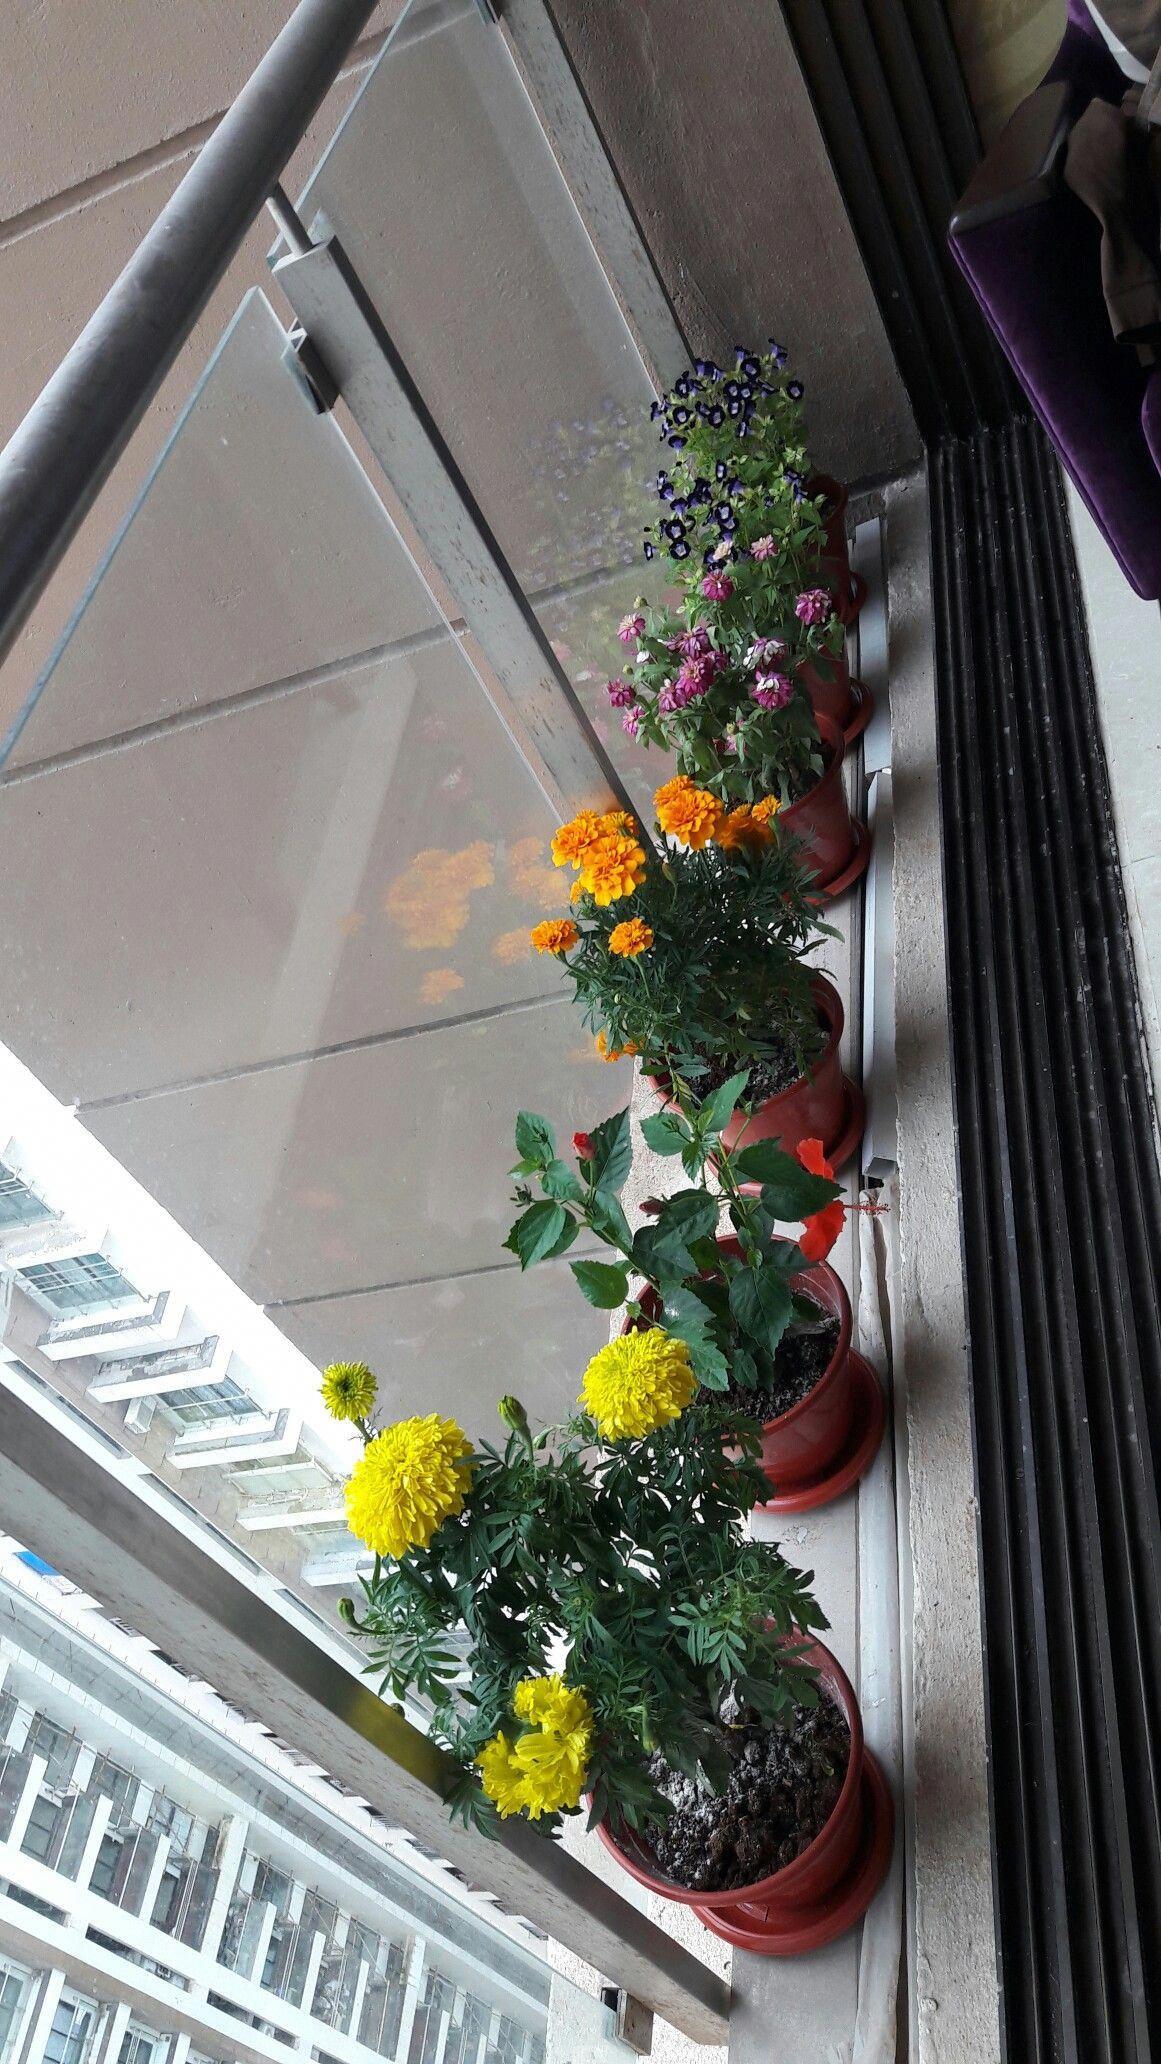 Pin by Rasika kothari on gardening India decor, Balcony